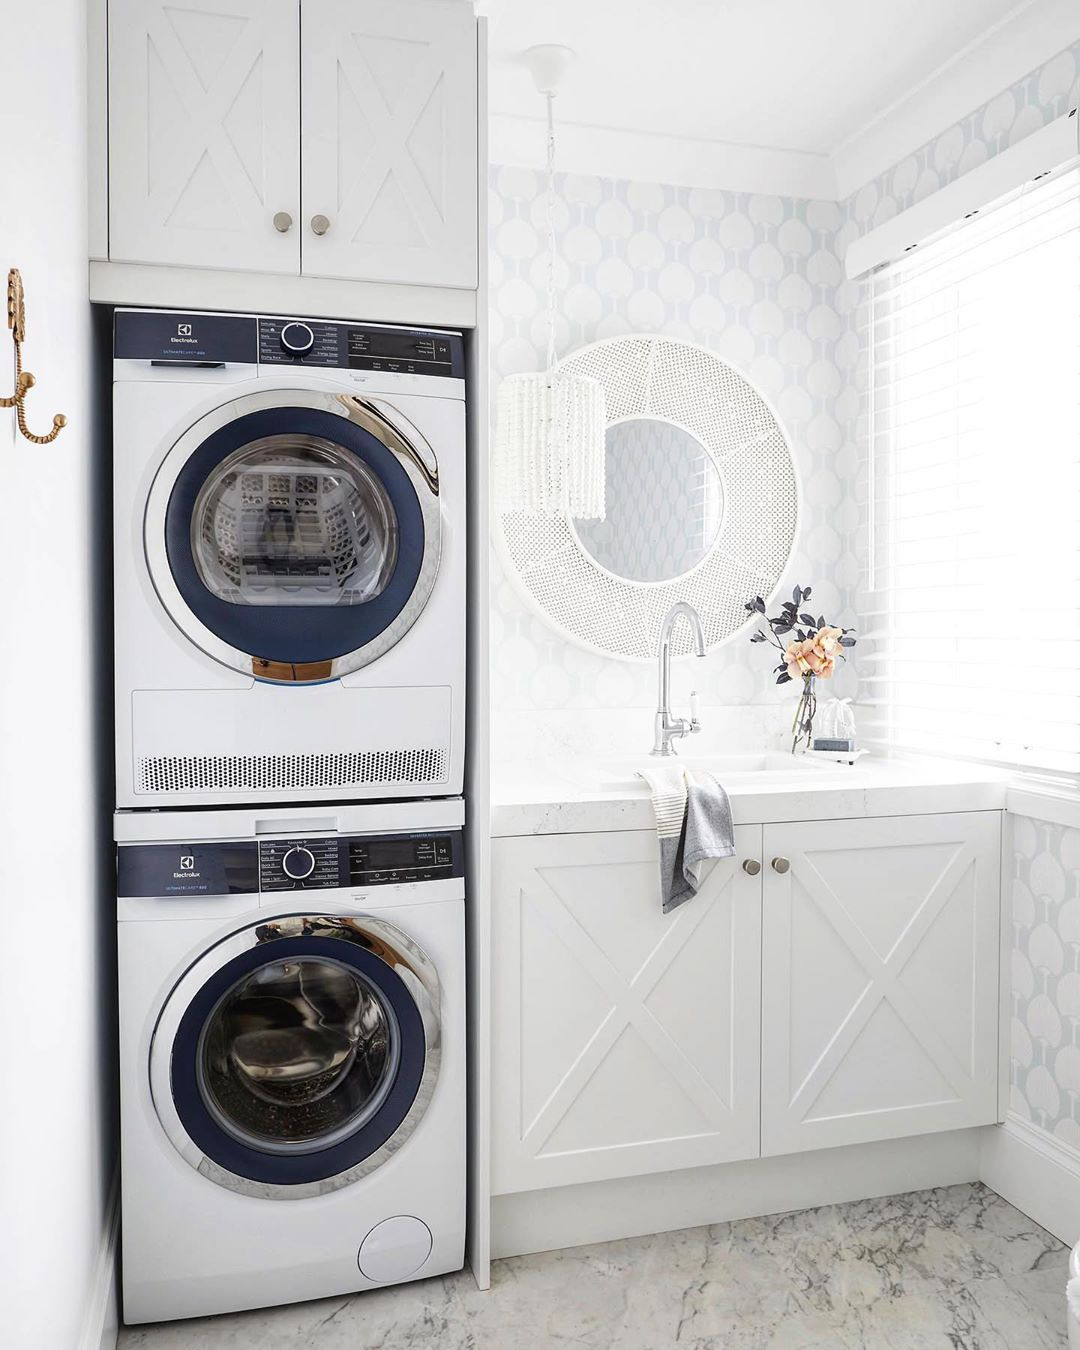 Laundry Renovation In 2020 Small Bathroom Renovations Beautiful Bathroom Renovations Bathroom Renovations Perth